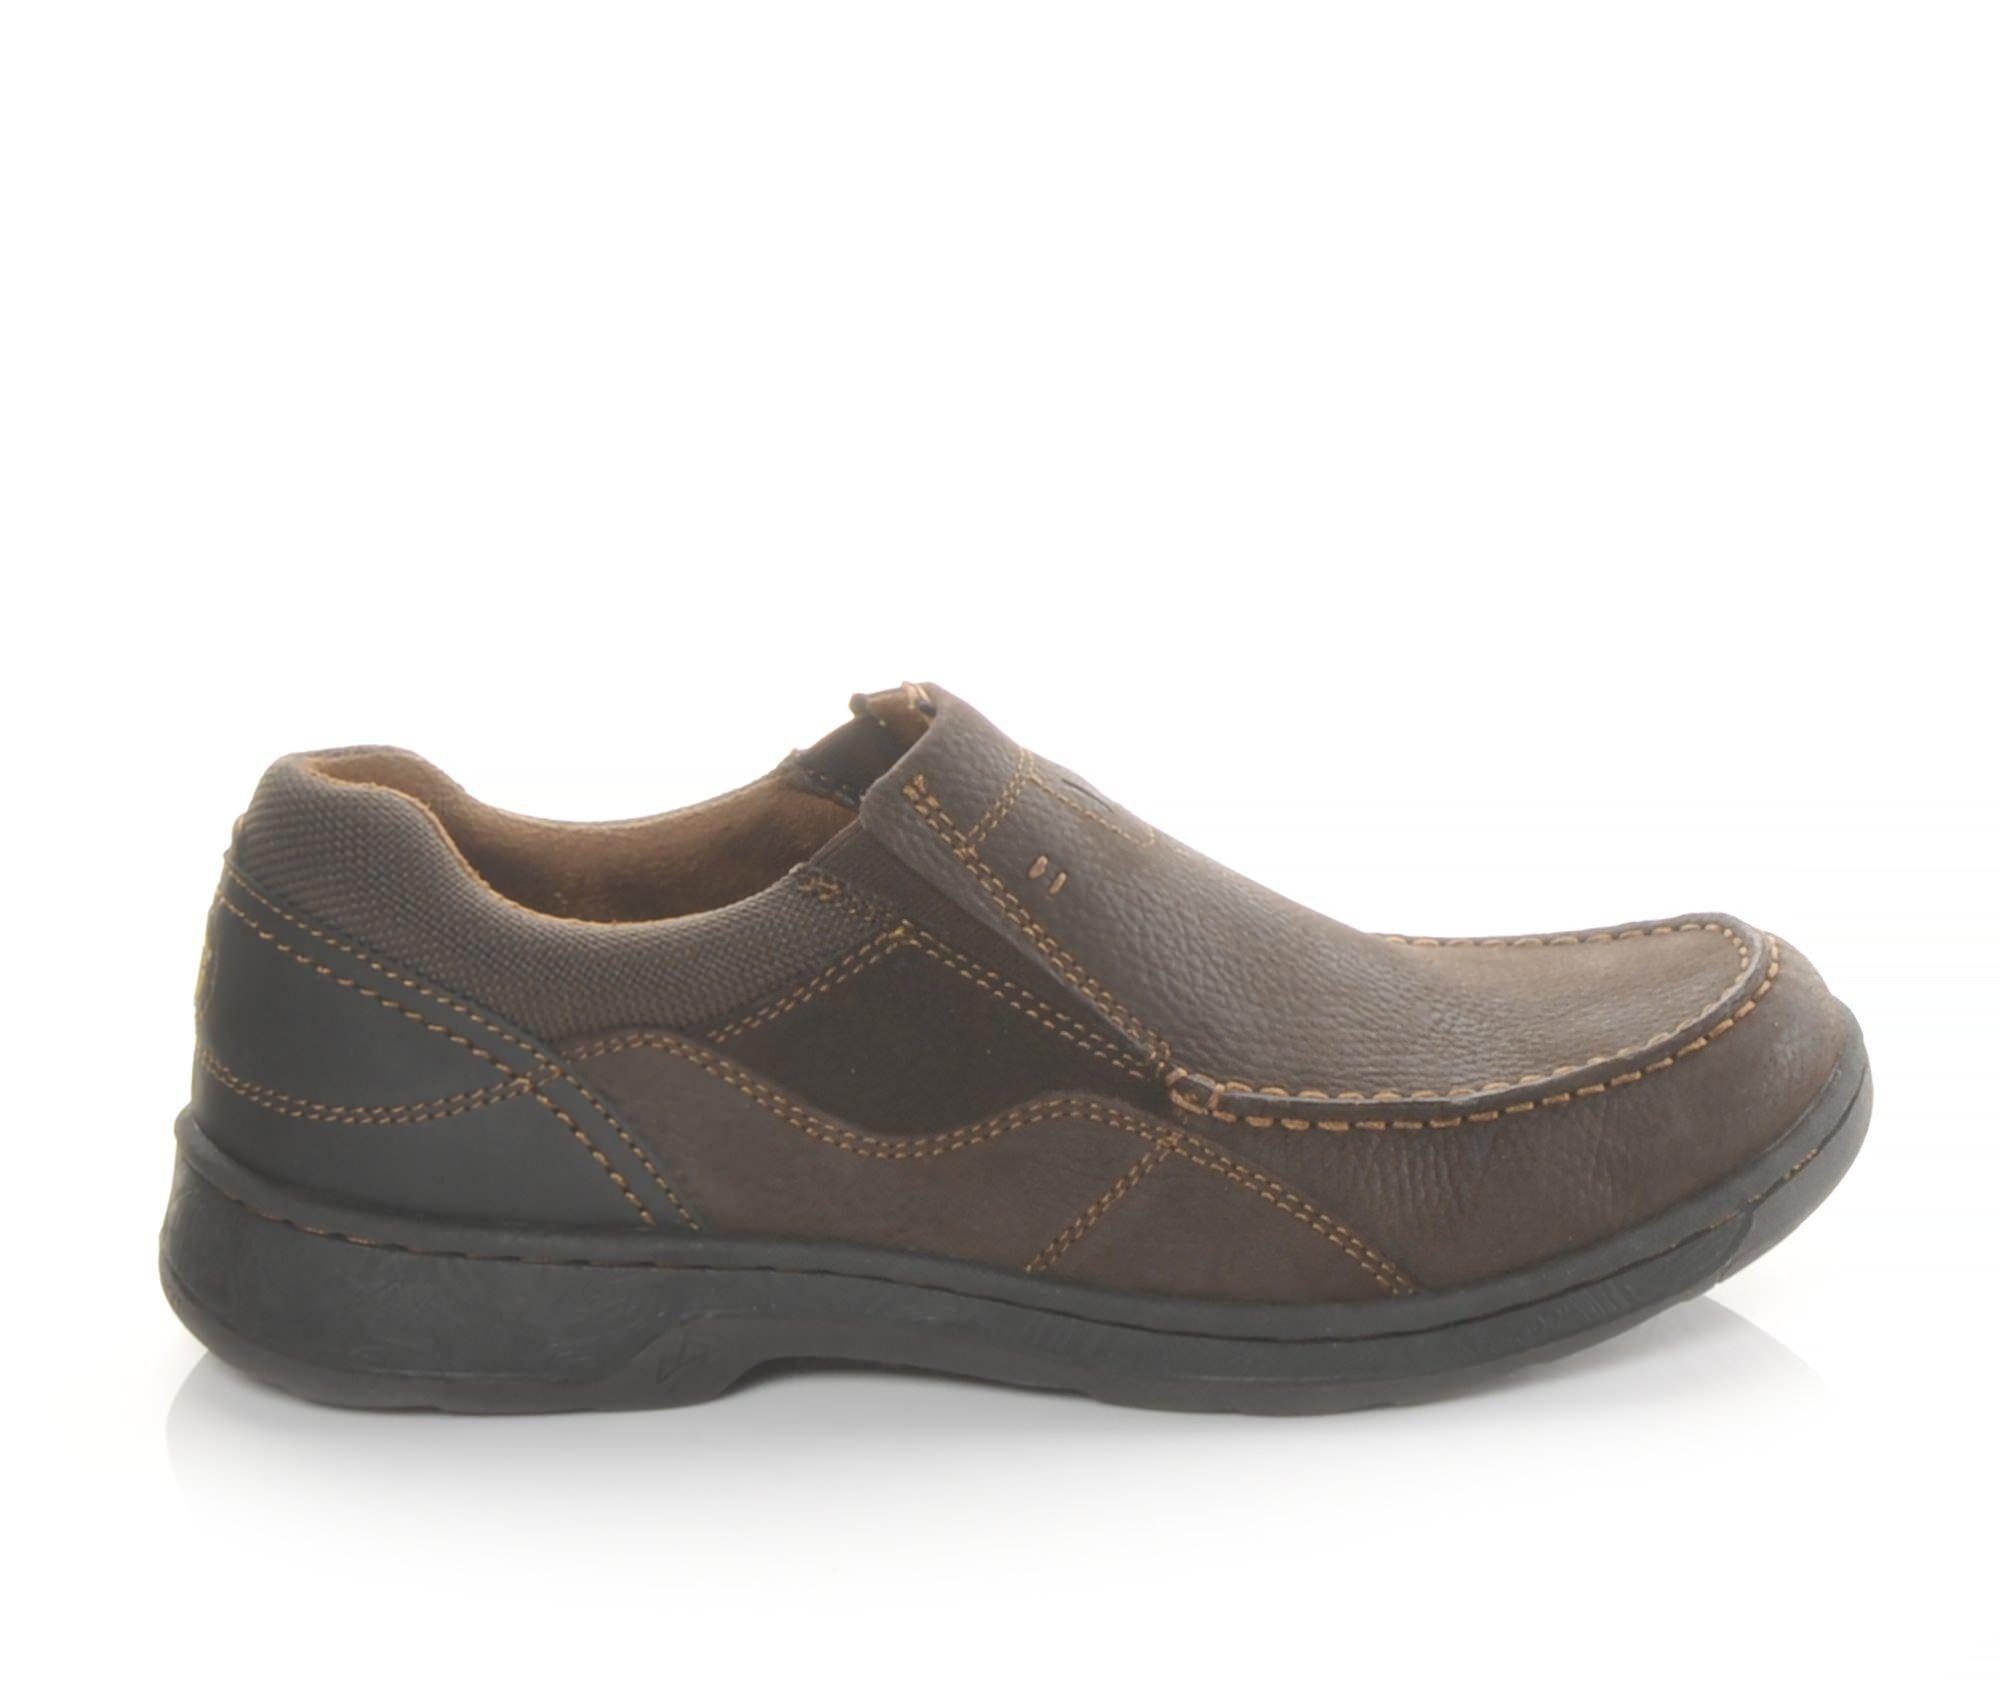 Men's Nunn Bush Brookston Slip-On Shoes Brown